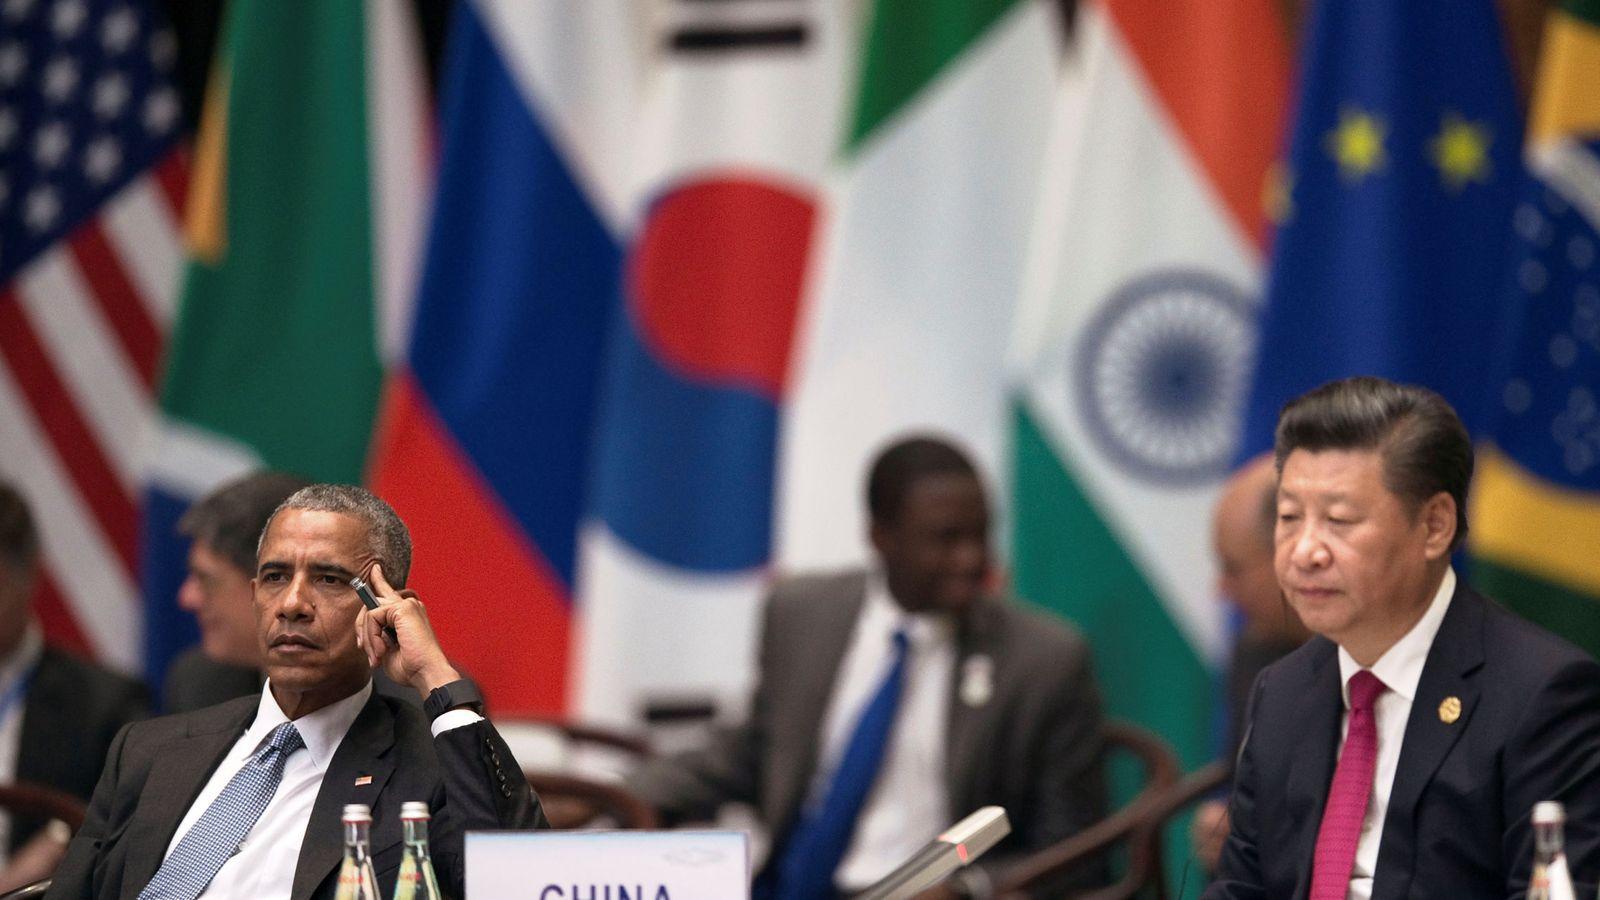 Foto: El presidente Barack Obama durante la ceremonia de apertura de la cumbre del G20 en Hangzhou, China, el 4 de spetiembre de 2016 (Reuters).